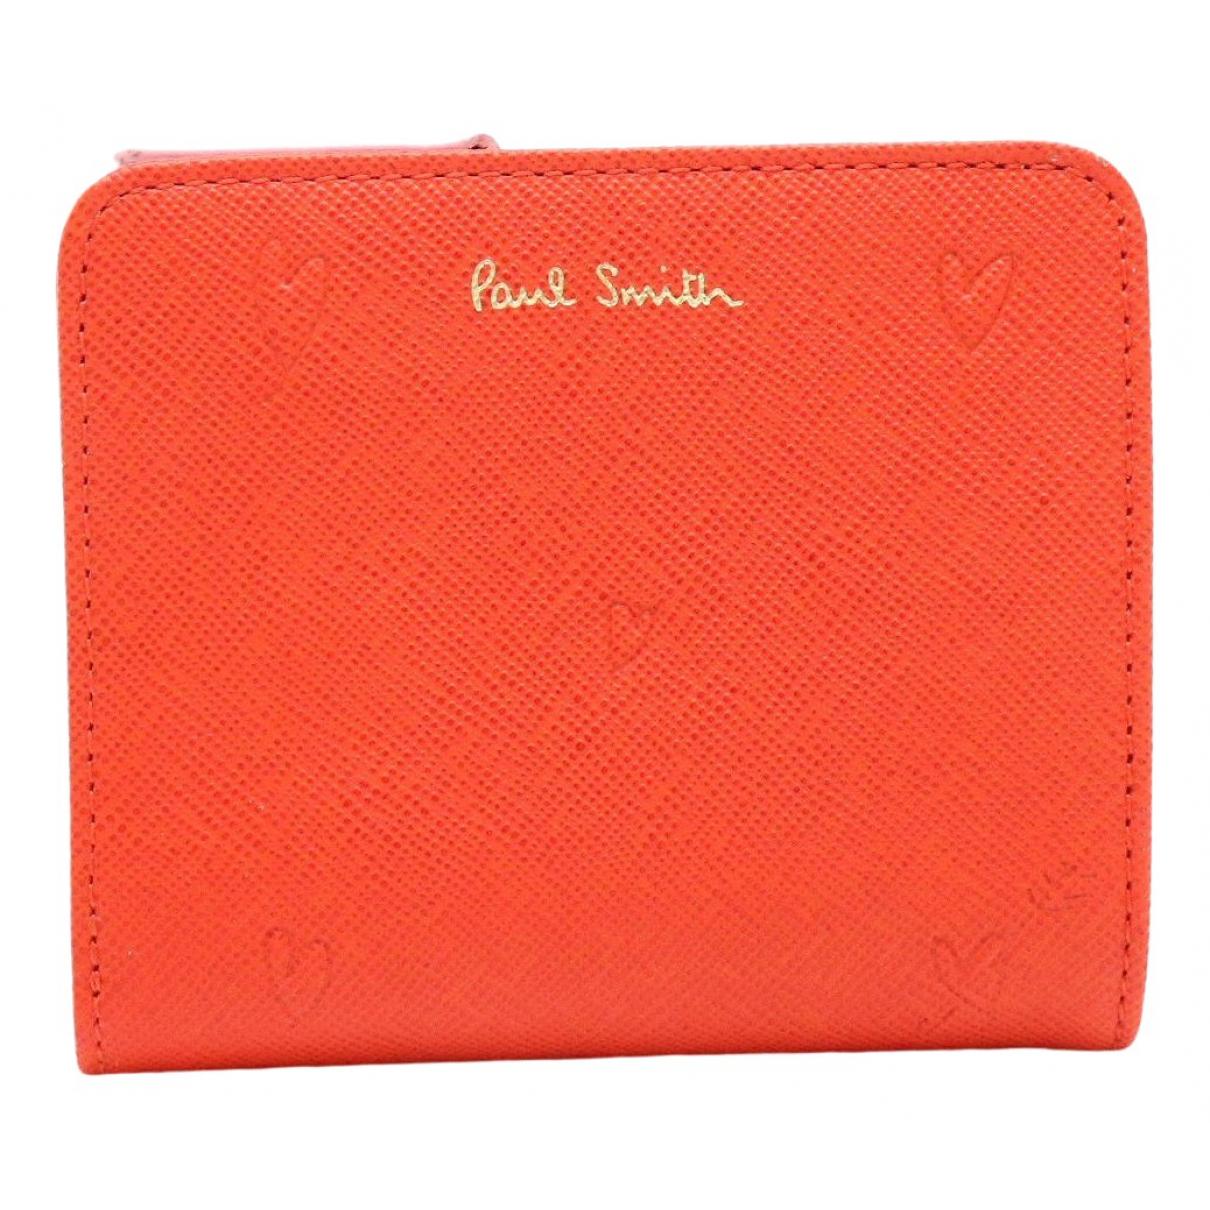 Paul Smith \N Portemonnaie in  Rosa Leder